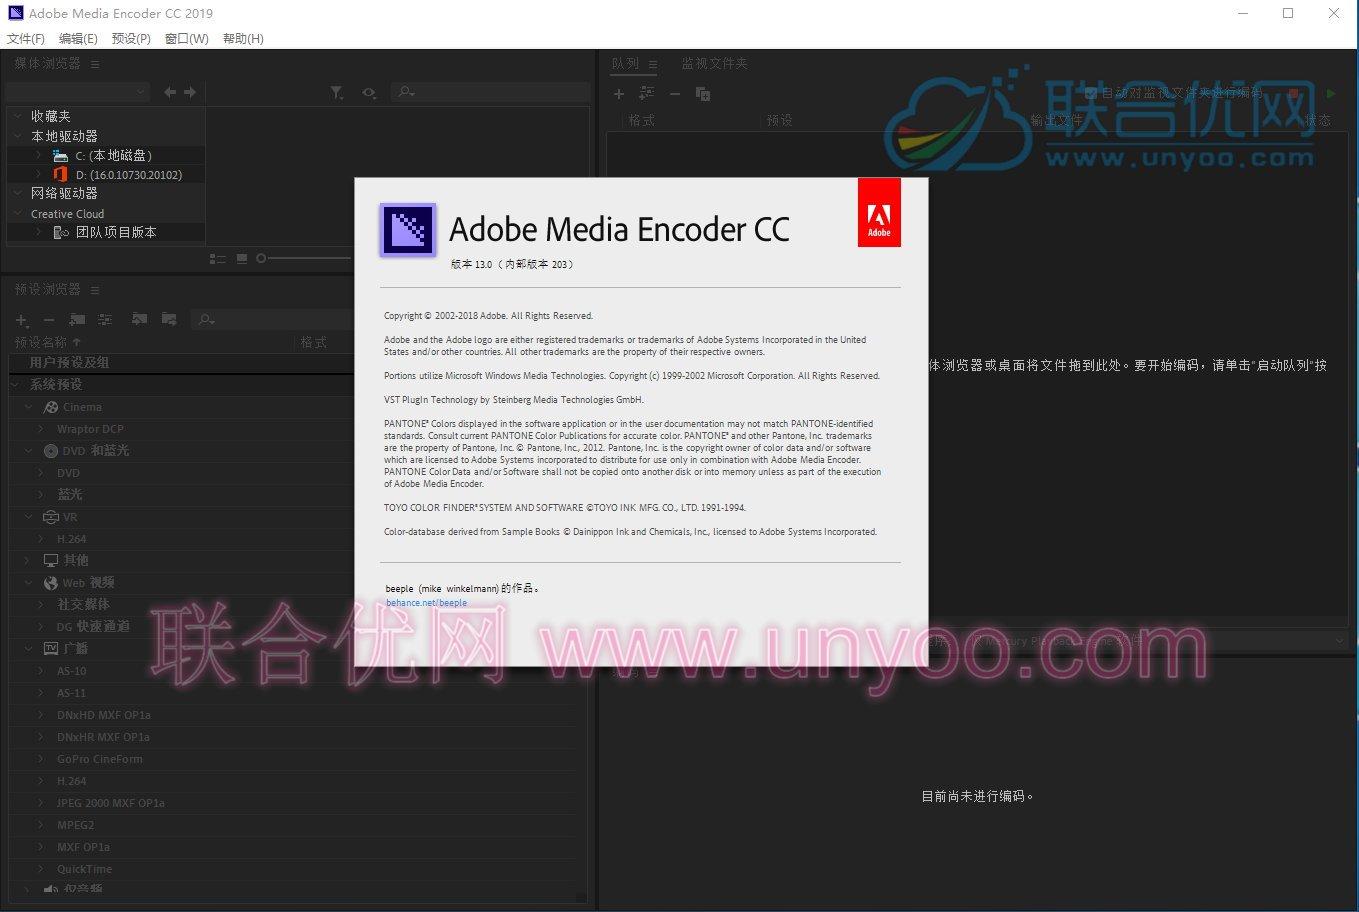 Adobe Media Encoder CC 2019 v13.0.203 Win/Mac 多语言中文正式注册版